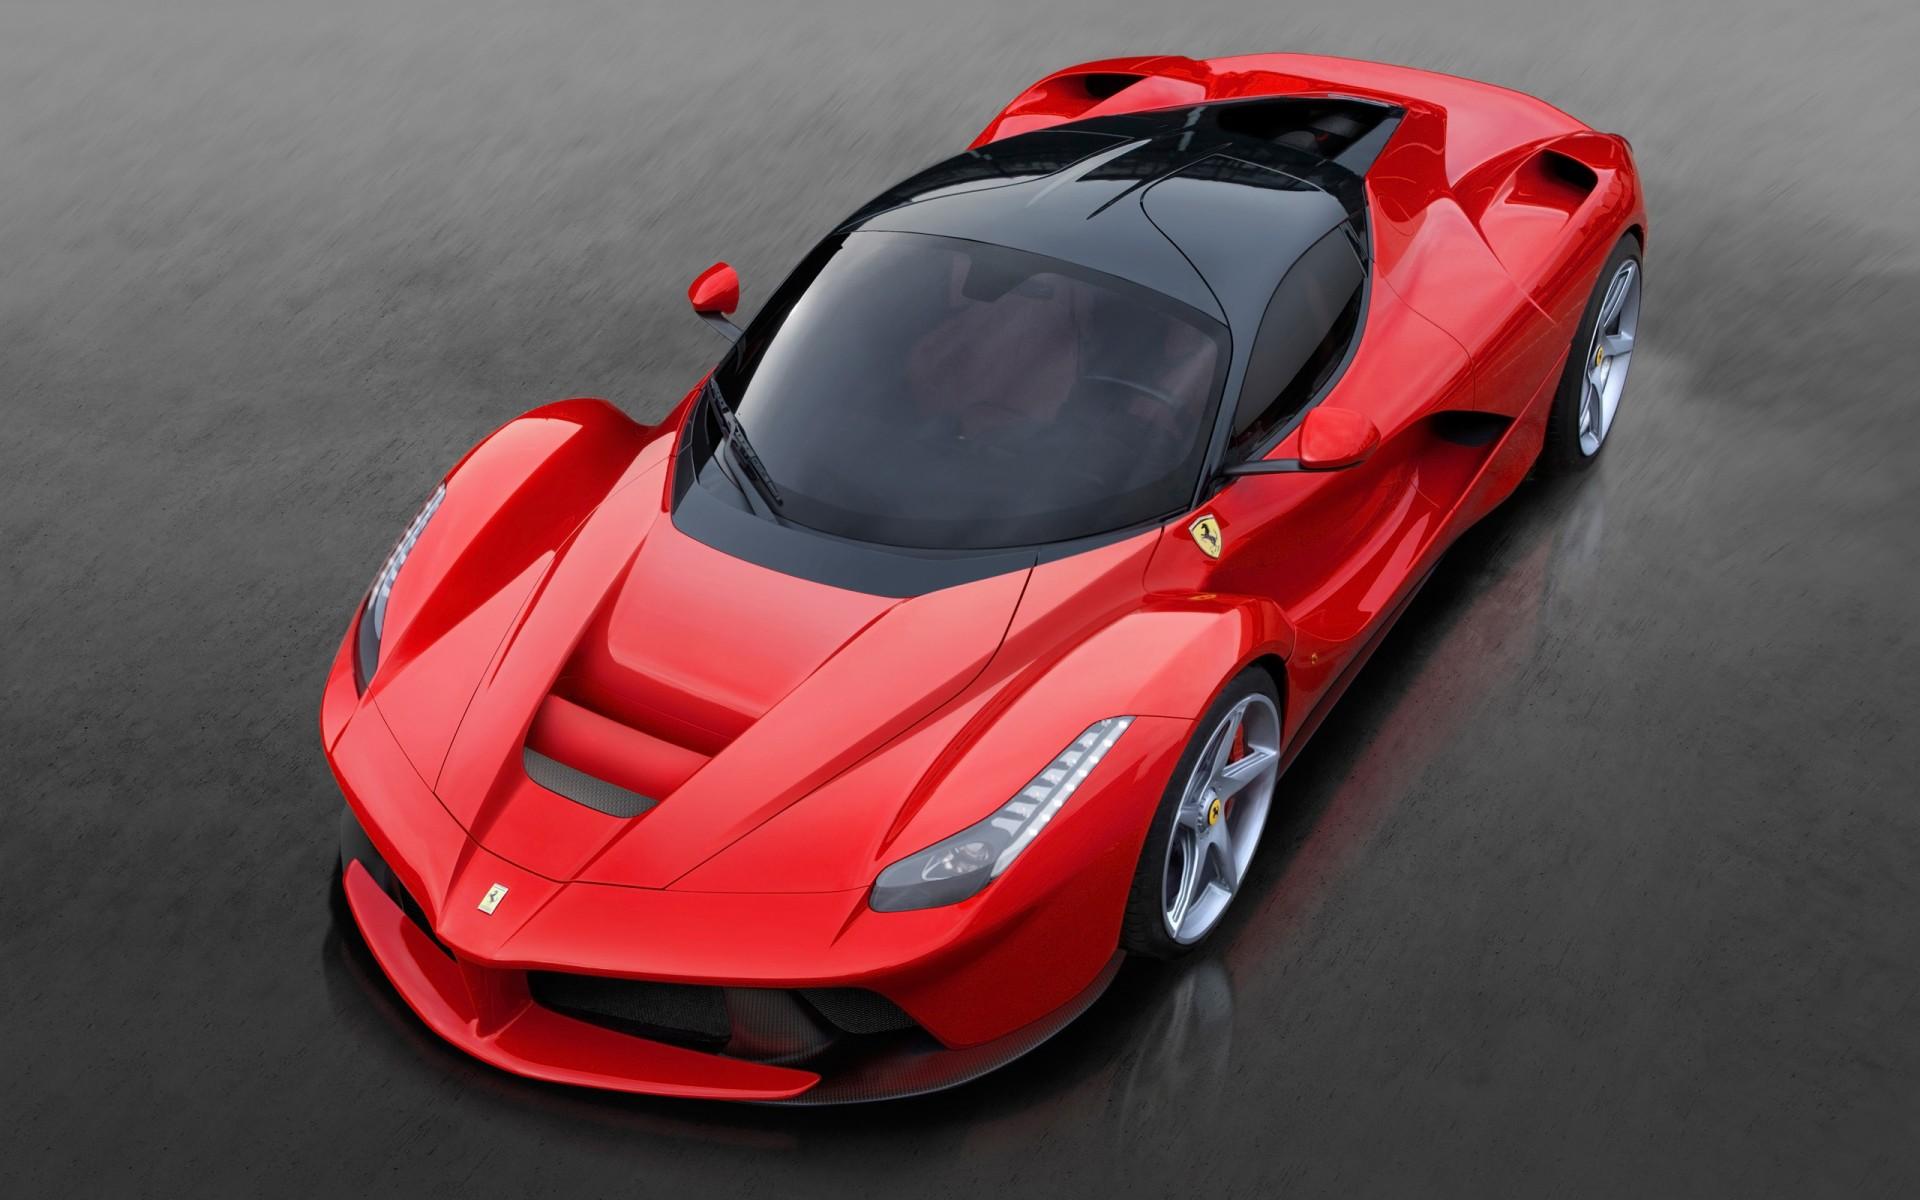 2013 Ferrari Laferrari 4 Wallpaper Hd Car Wallpapers Id 3592